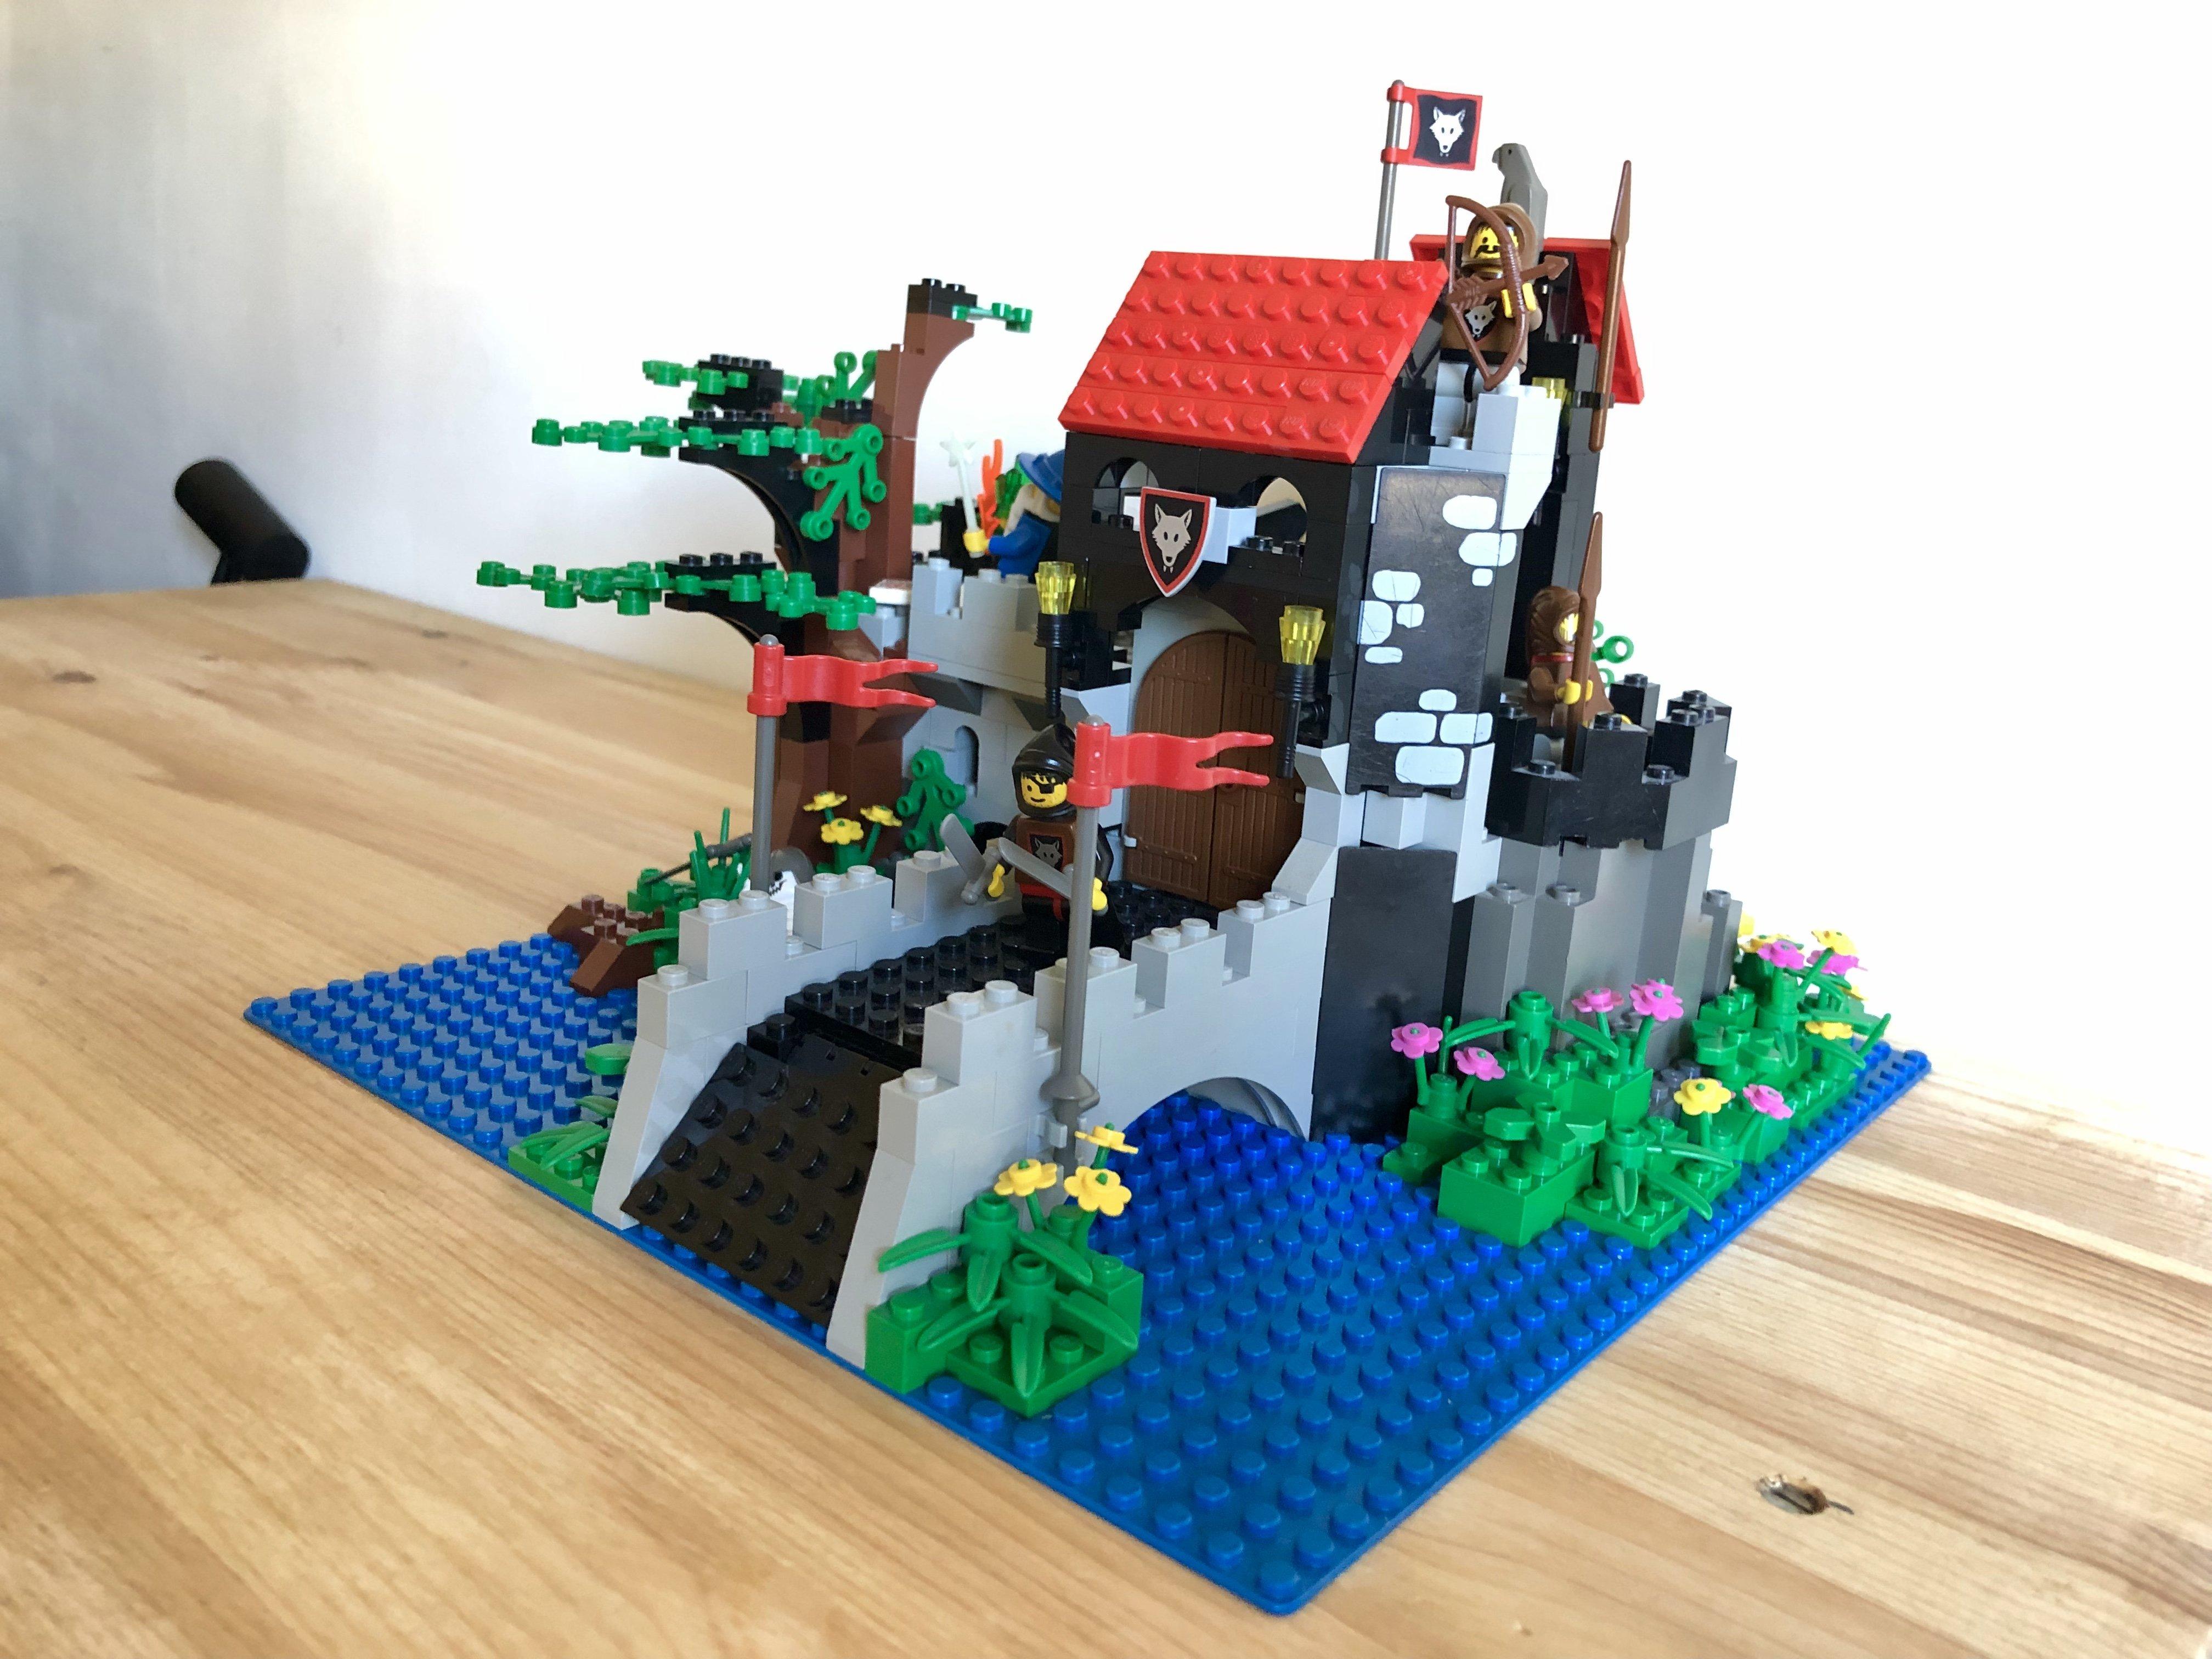 Vintage Lego Castle Getting Into It Page 2 Brickset Forum